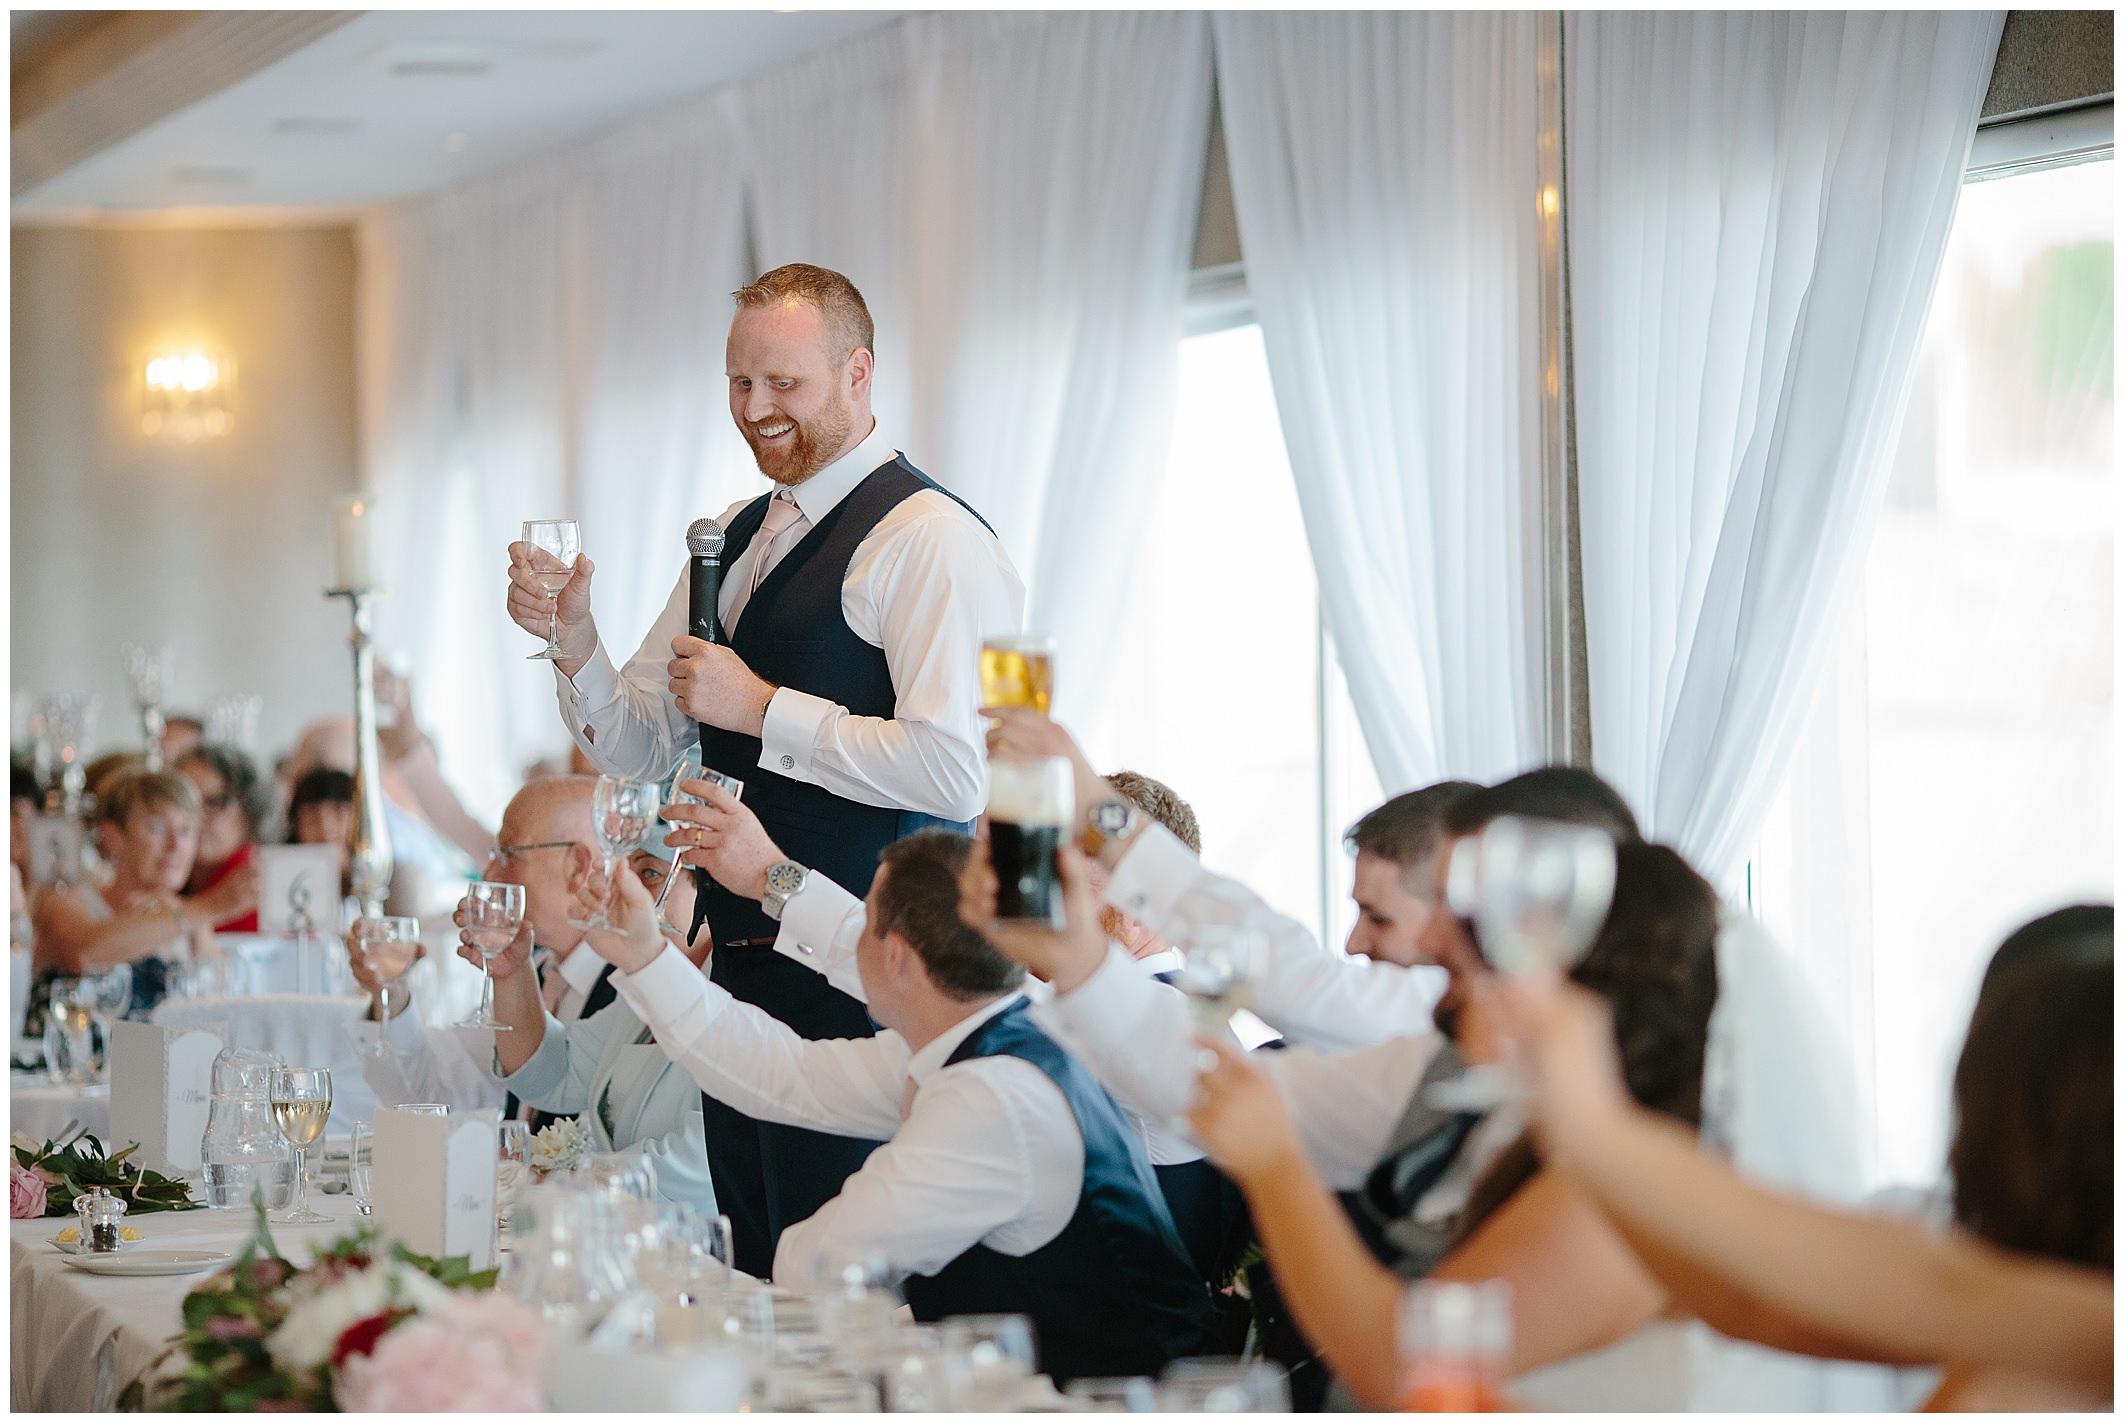 redcastle-hotel-wedding-karen-brian-jude-browne-photography-122.jpg